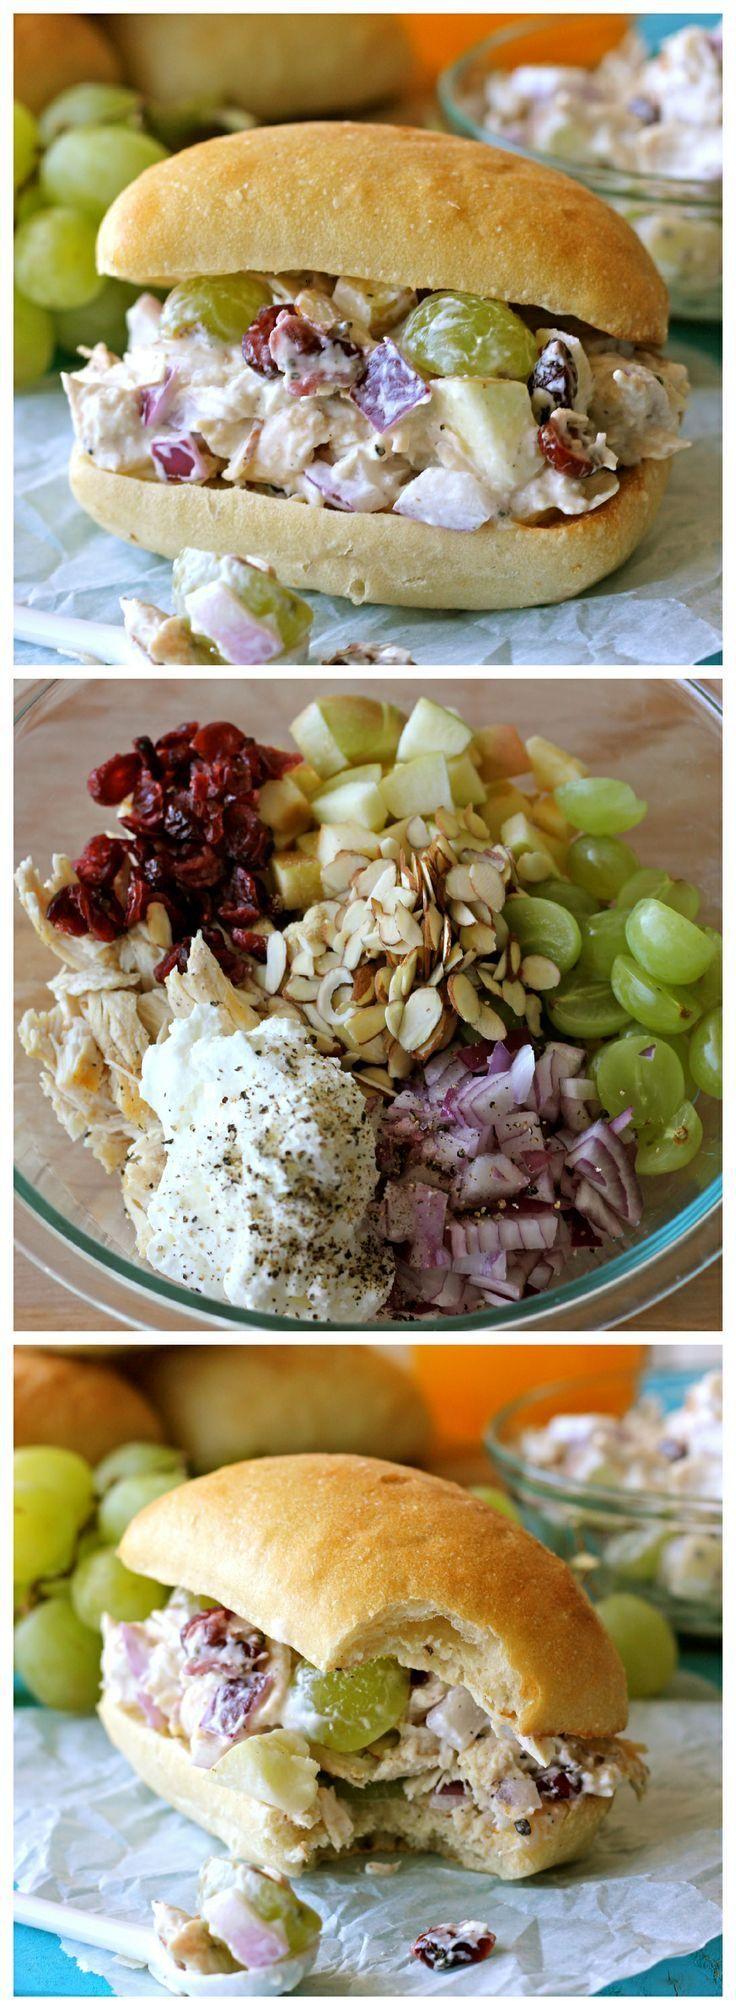 GREEK YOGURT CHICKEN SALAD SANDWICH.   YUM!!! Always need lunch ideas.